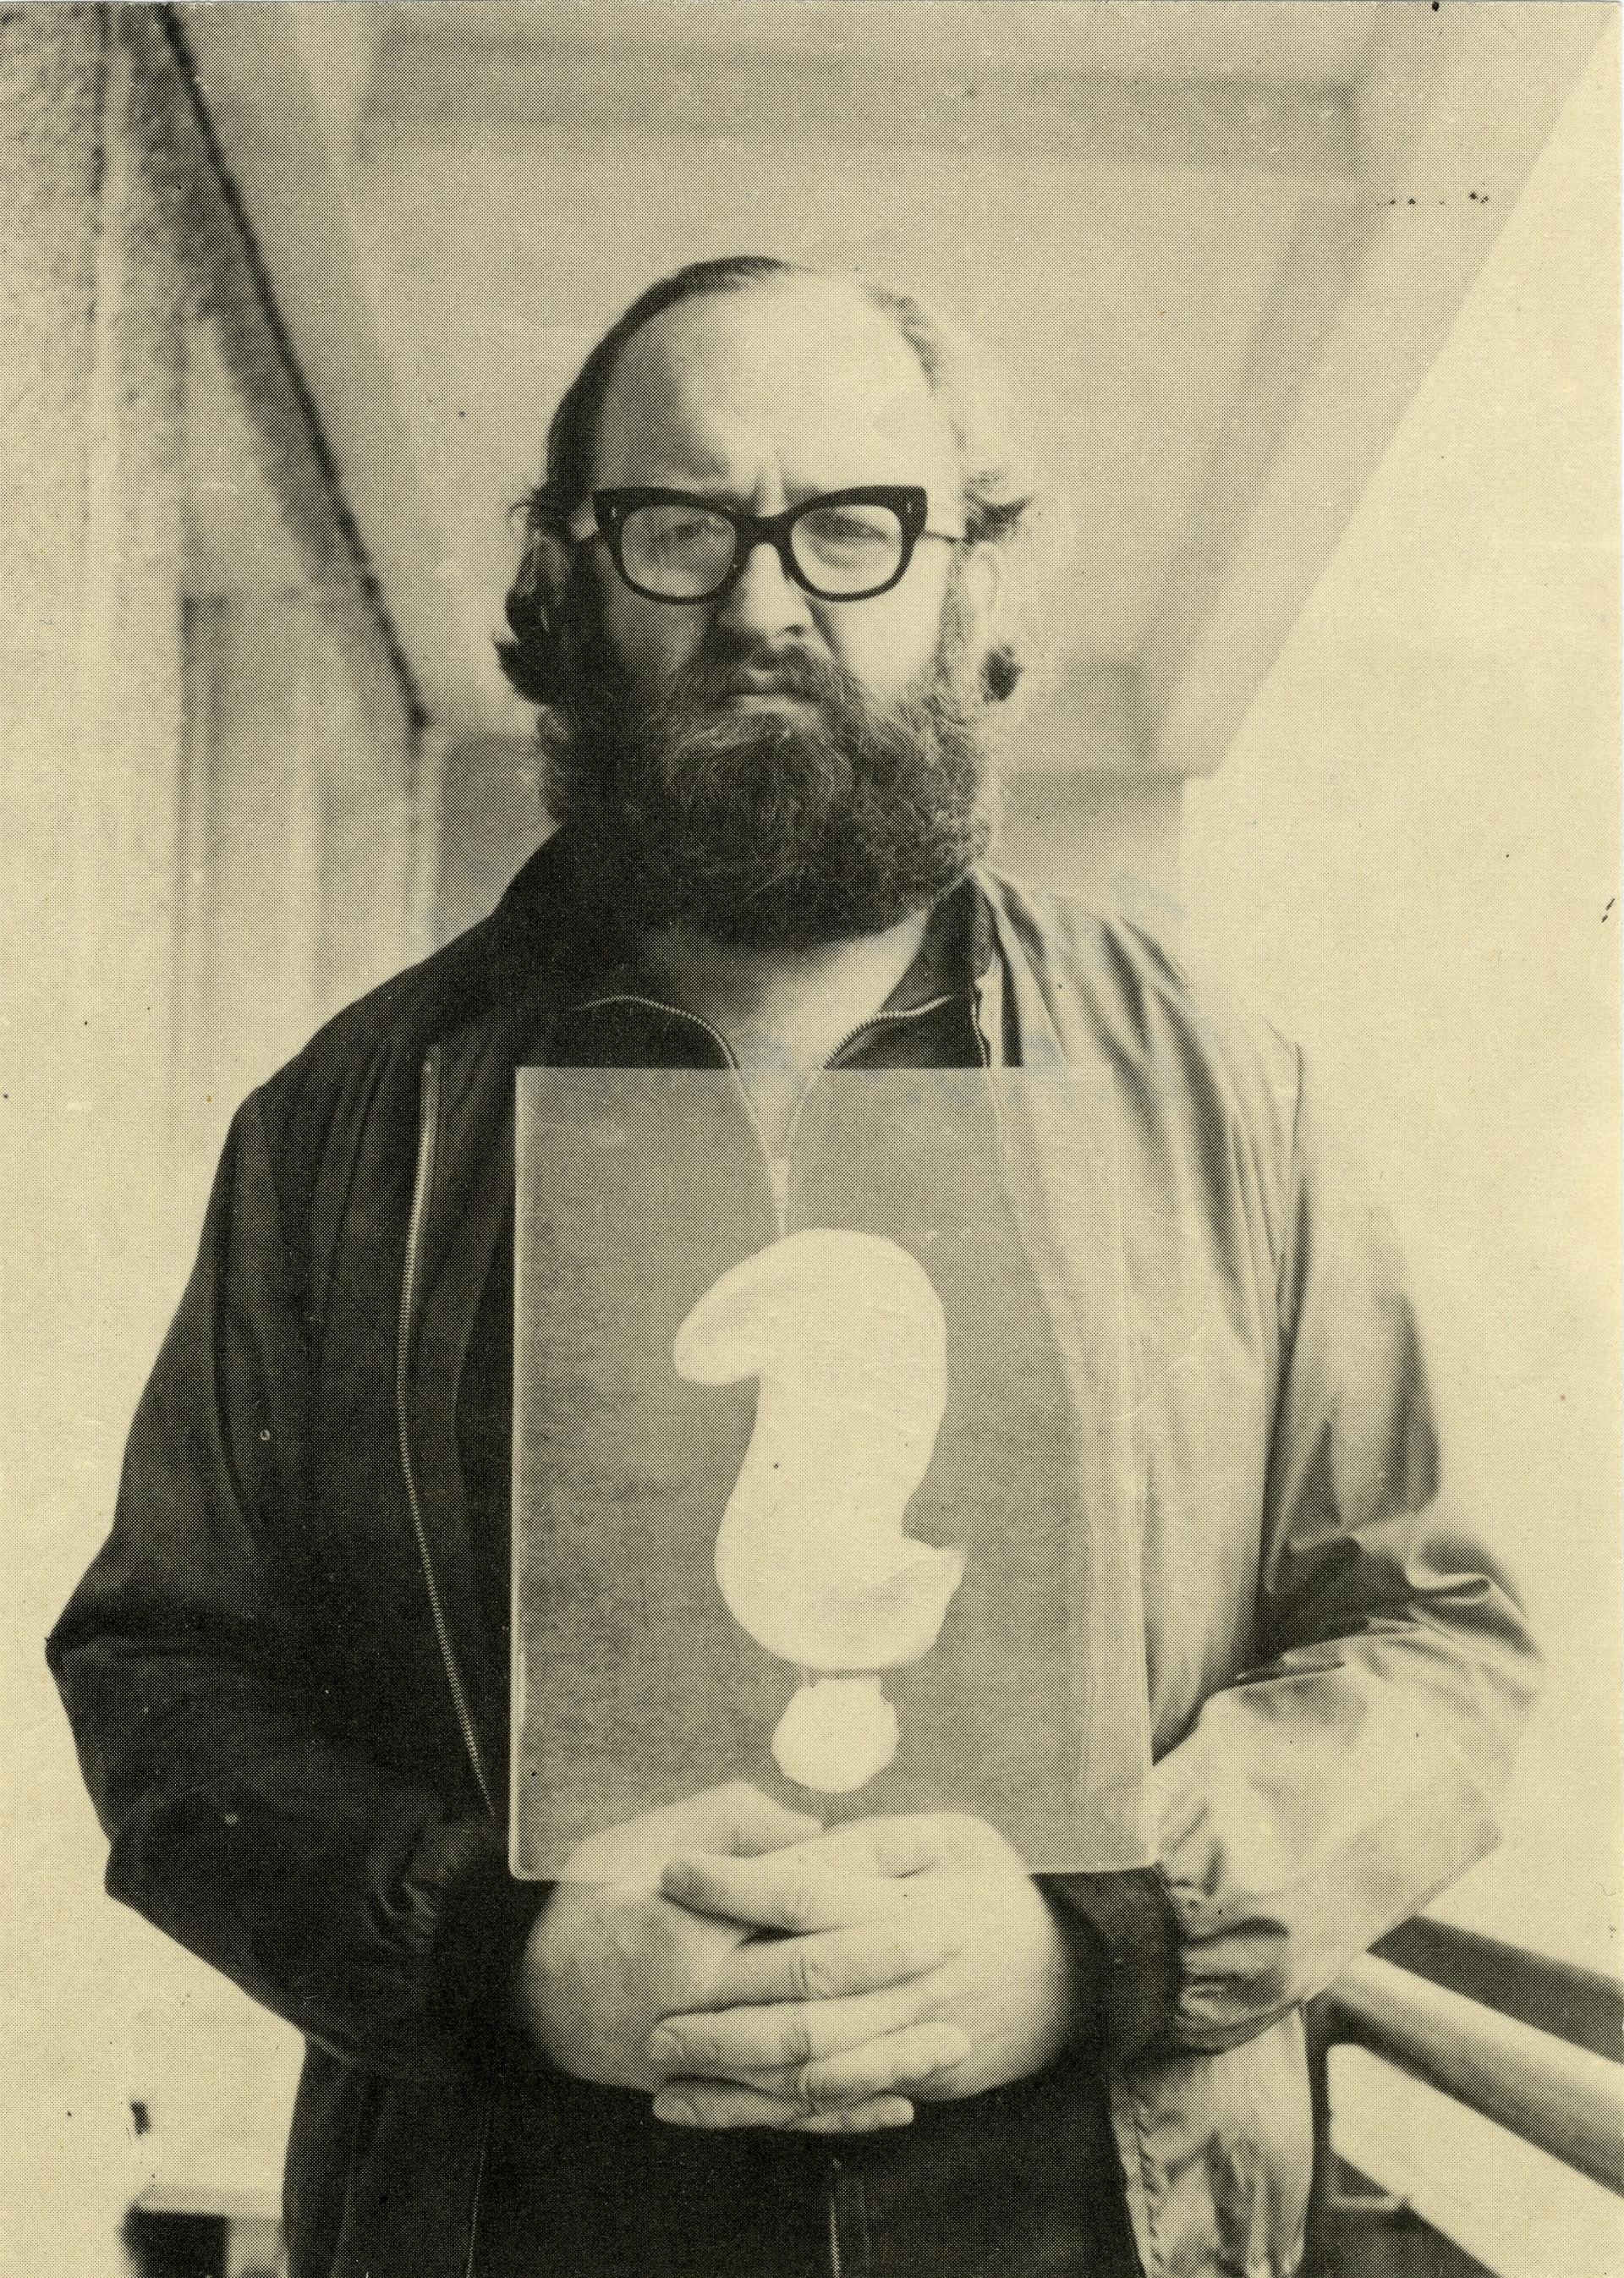 Július Koller, P.F. 1981 (U.F.O)